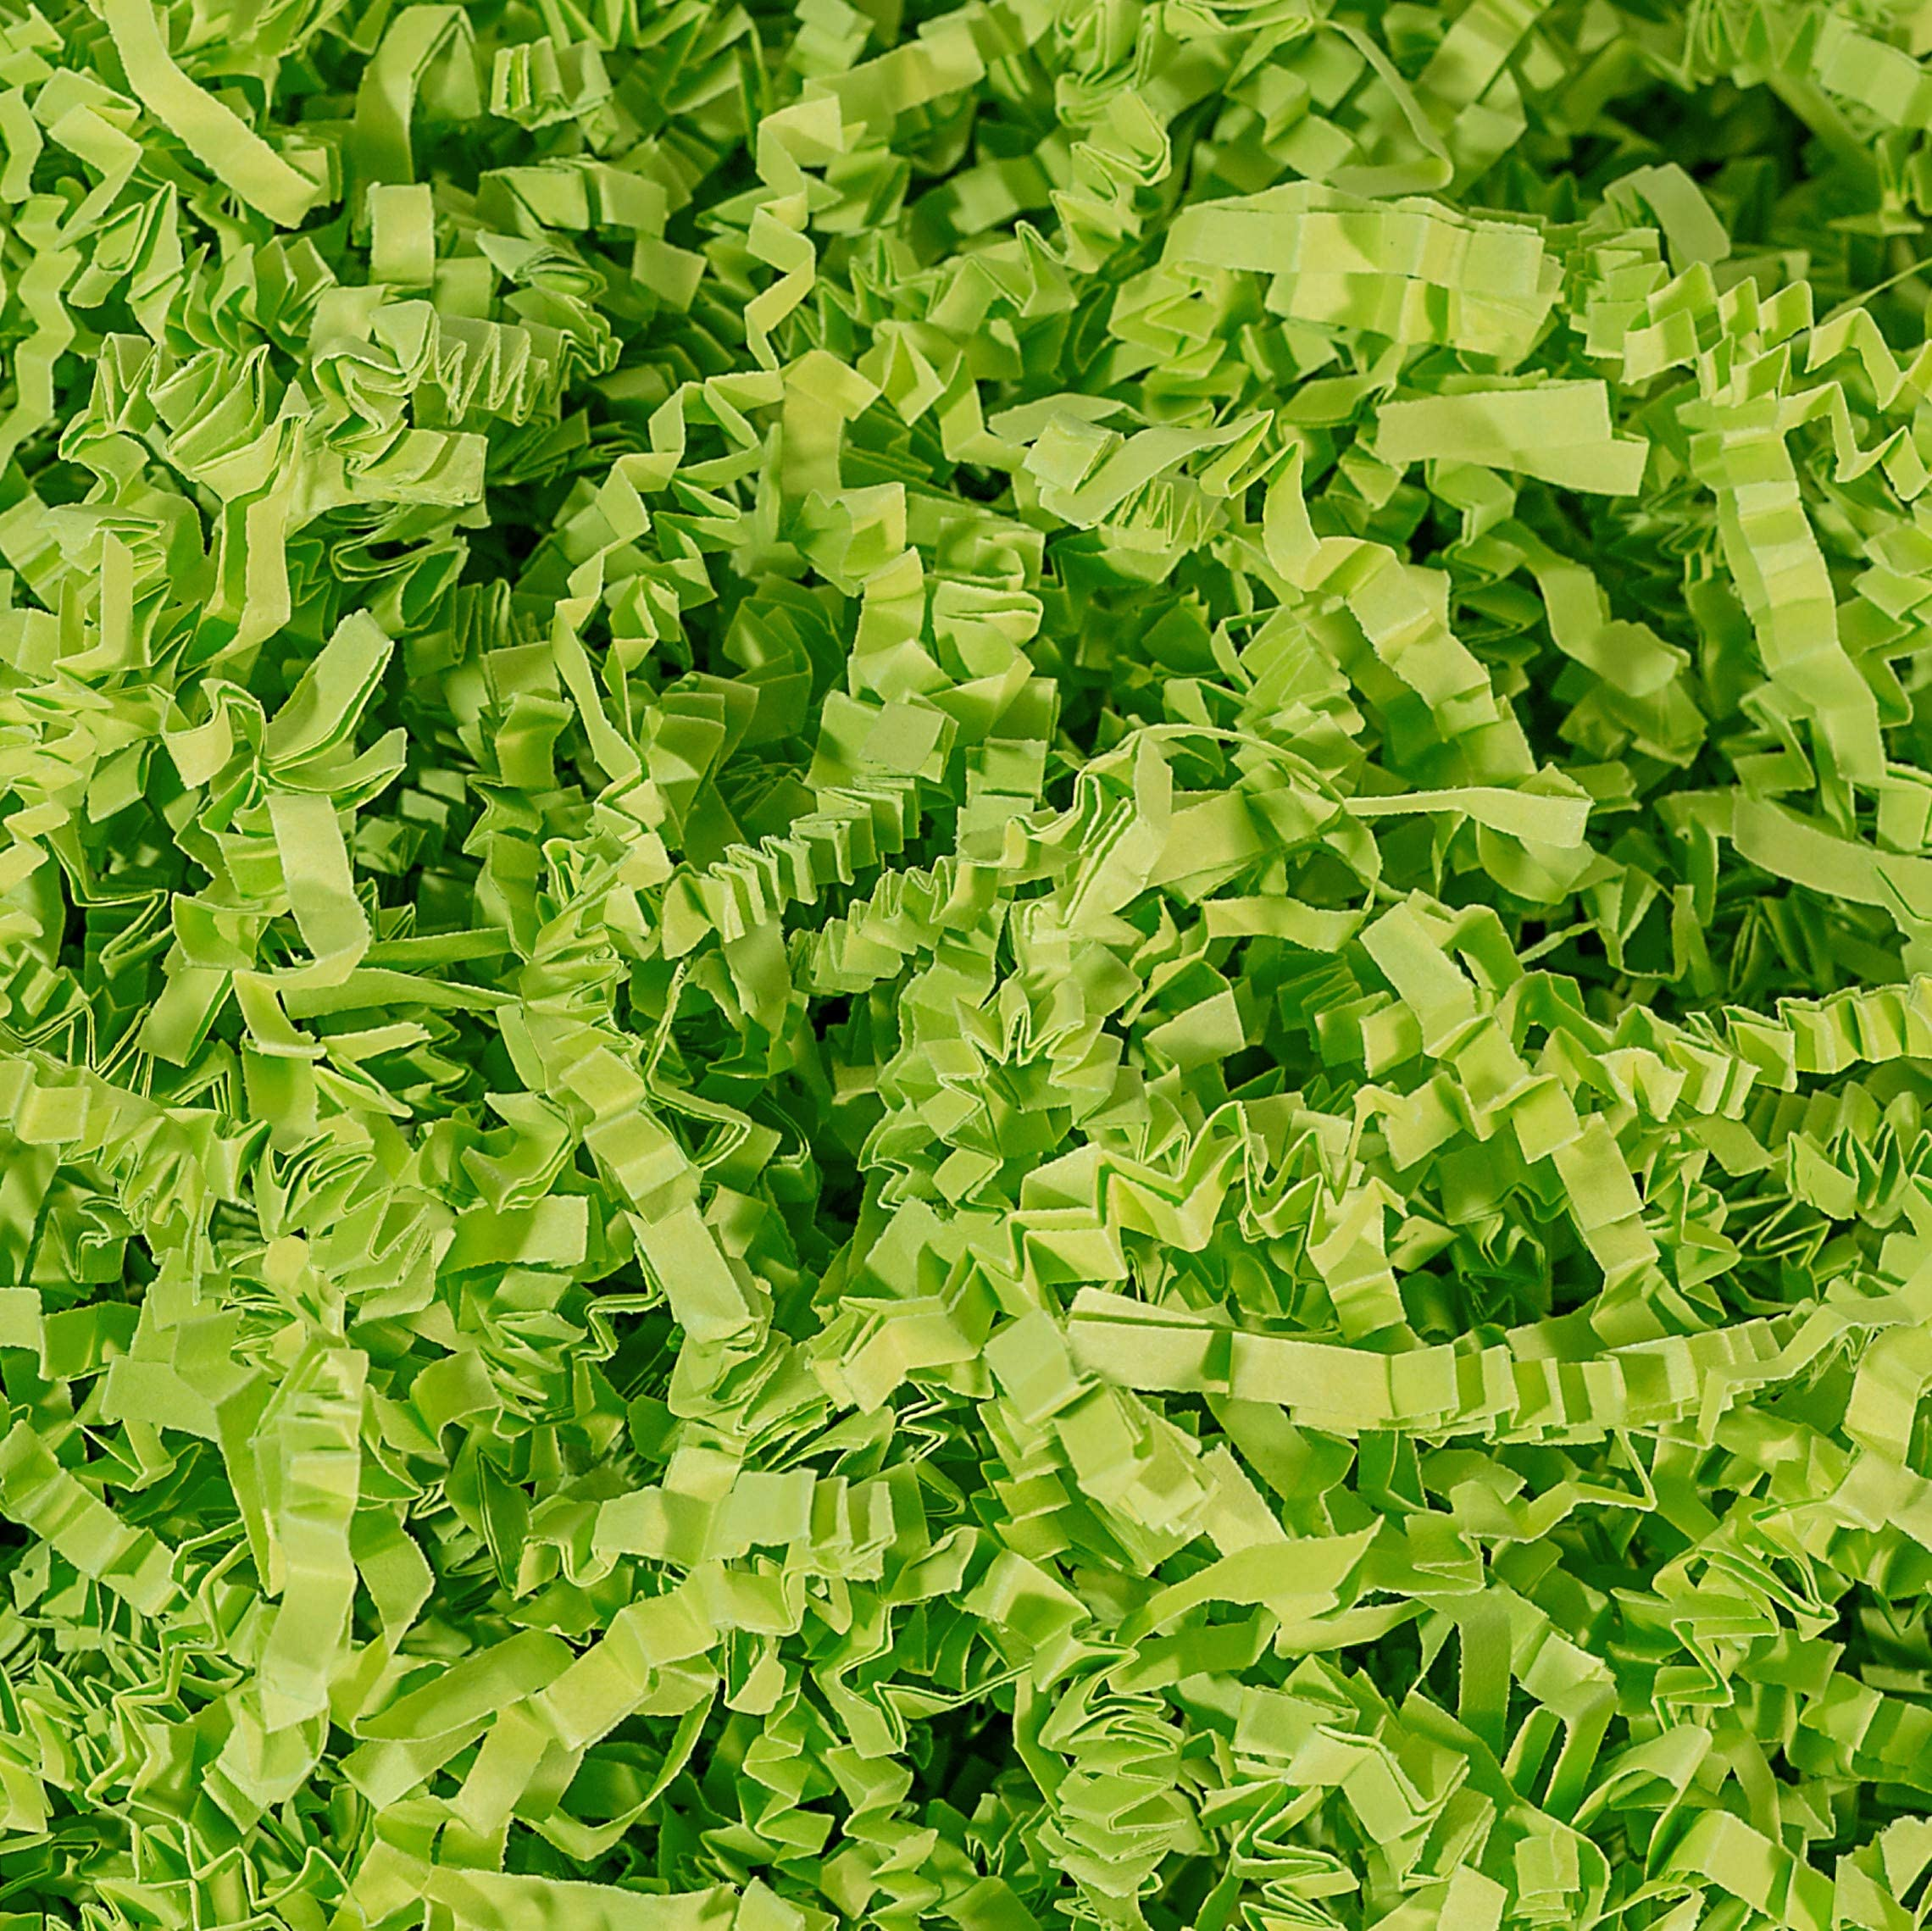 8 oz Mint Green   VeryFine Fine Cut packaging White Gift Basket Shred Paper Filler Shred Display Bedding gift wrap